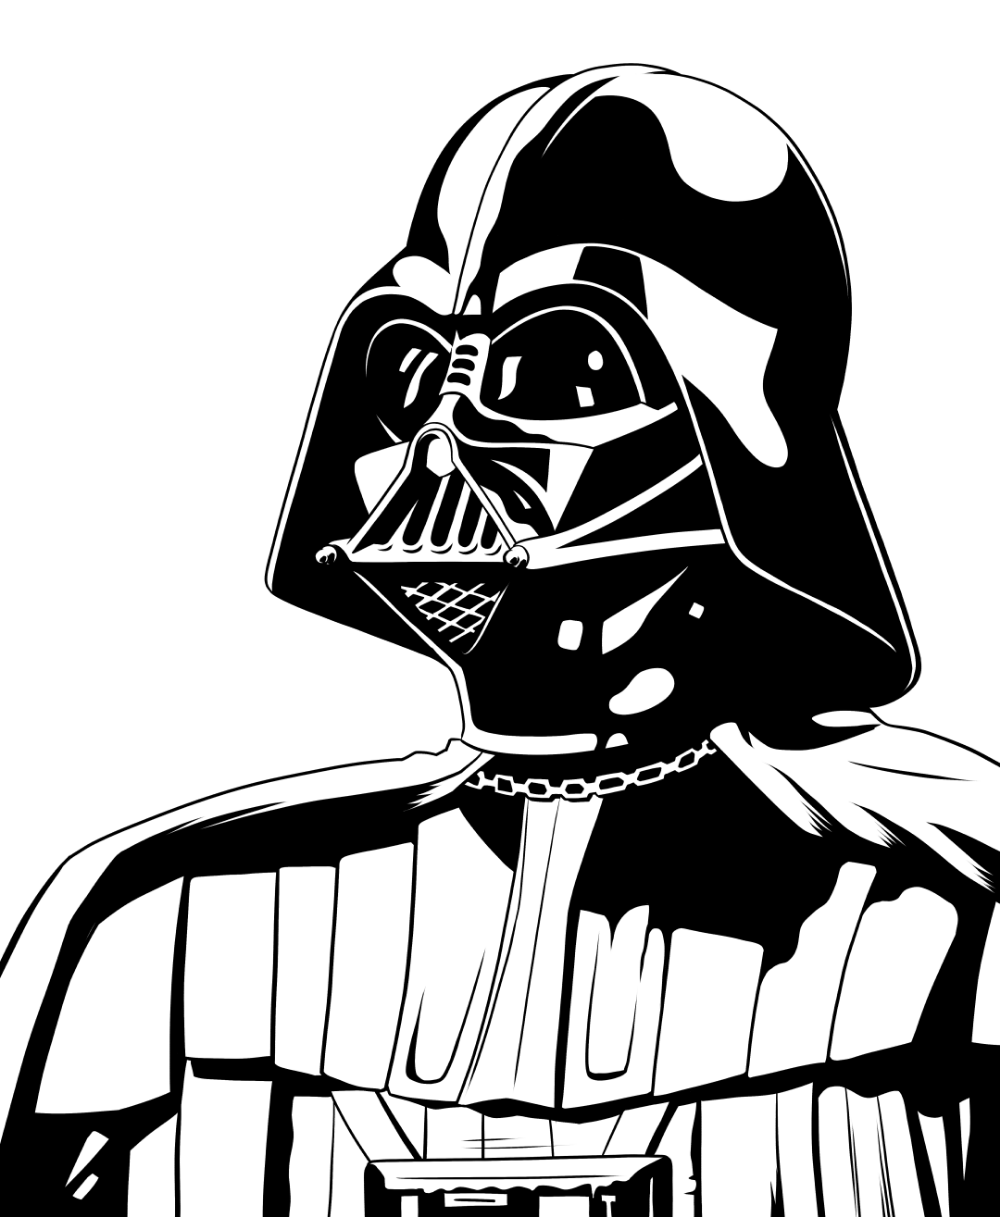 Darth Vader Outline : darth, vader, outline, Darth, Vader, Comic, Outline, Penelusuran, Google, Feutres, Alcool,, Dessin,, Alcool